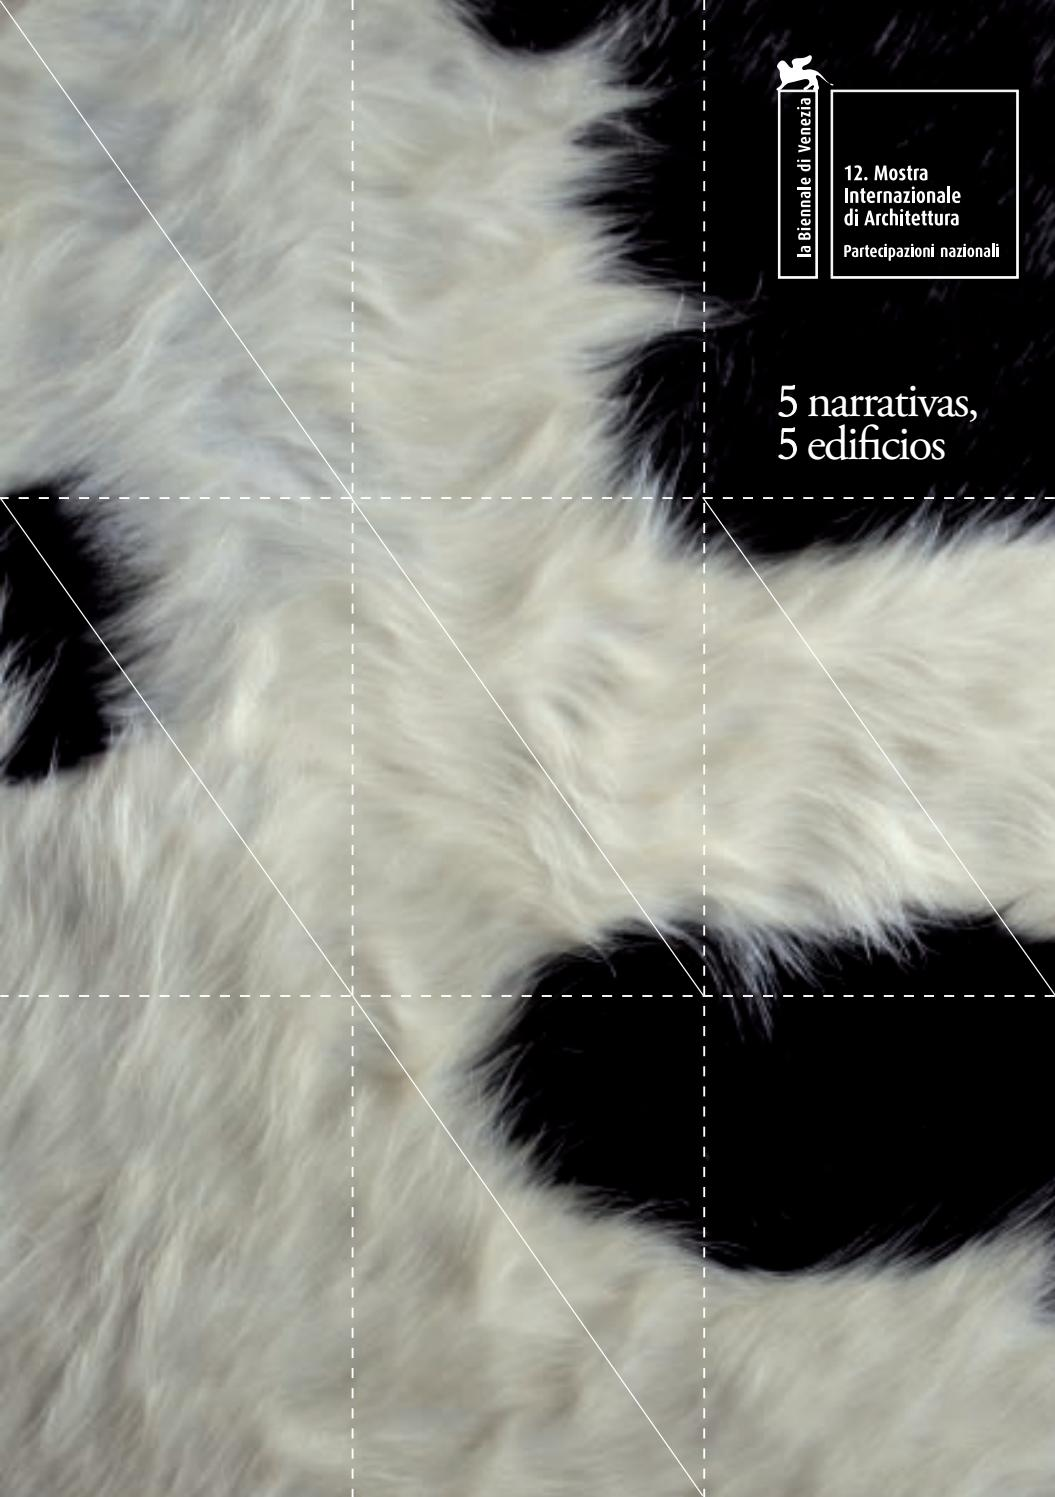 5 narrativas, 5 edificios by Martin Craciun - issuu